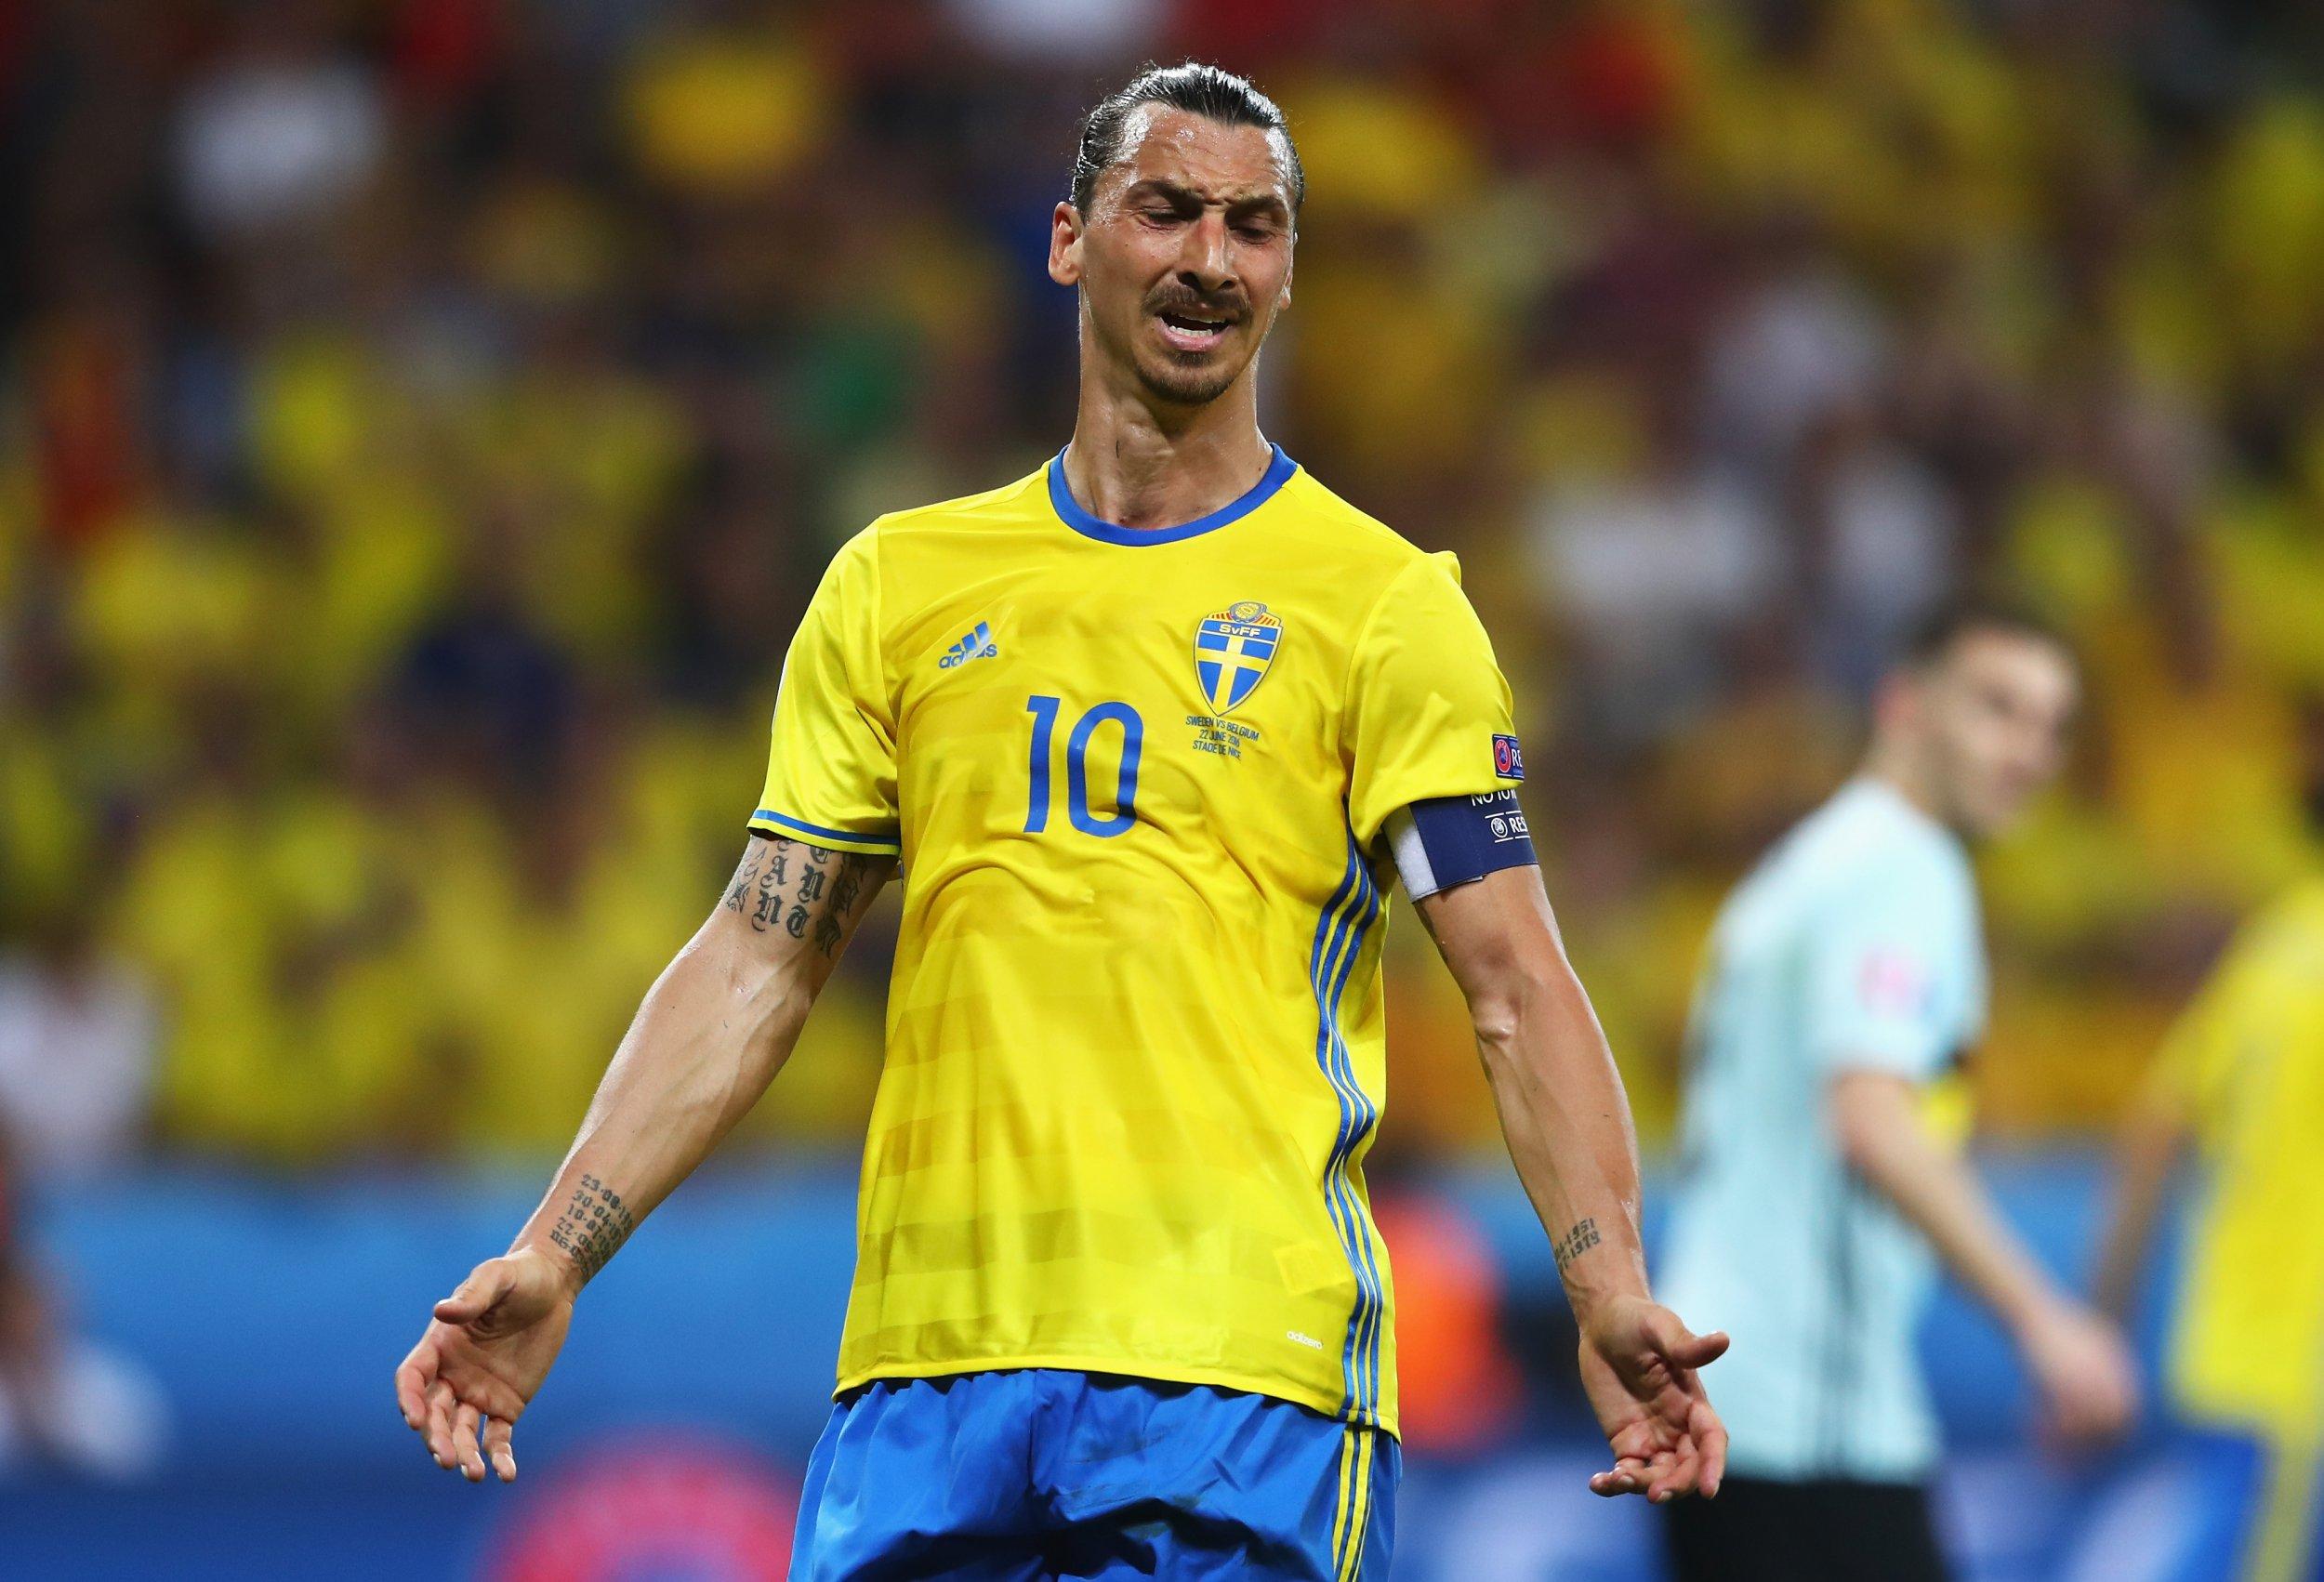 Sweden and Manchester United striker Zlatan Ibrahimovic